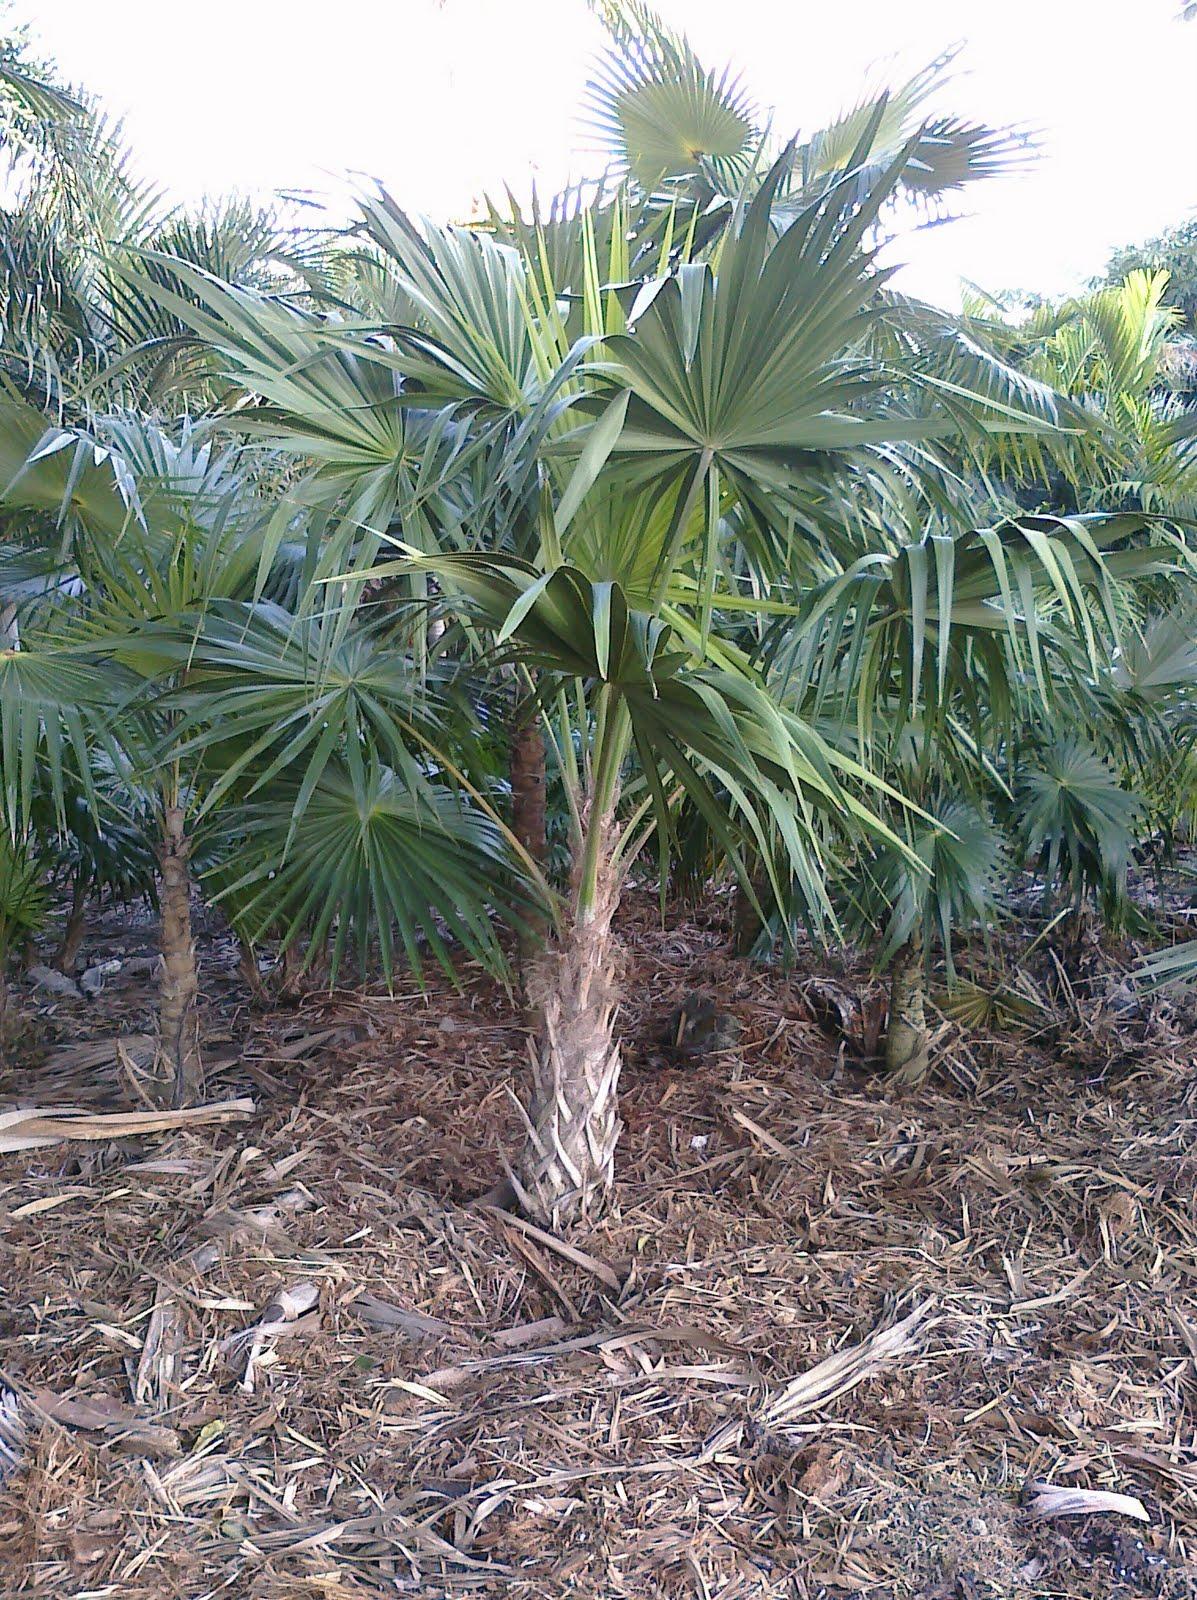 A Quality Plant Florida Thatch Palm Florida Native